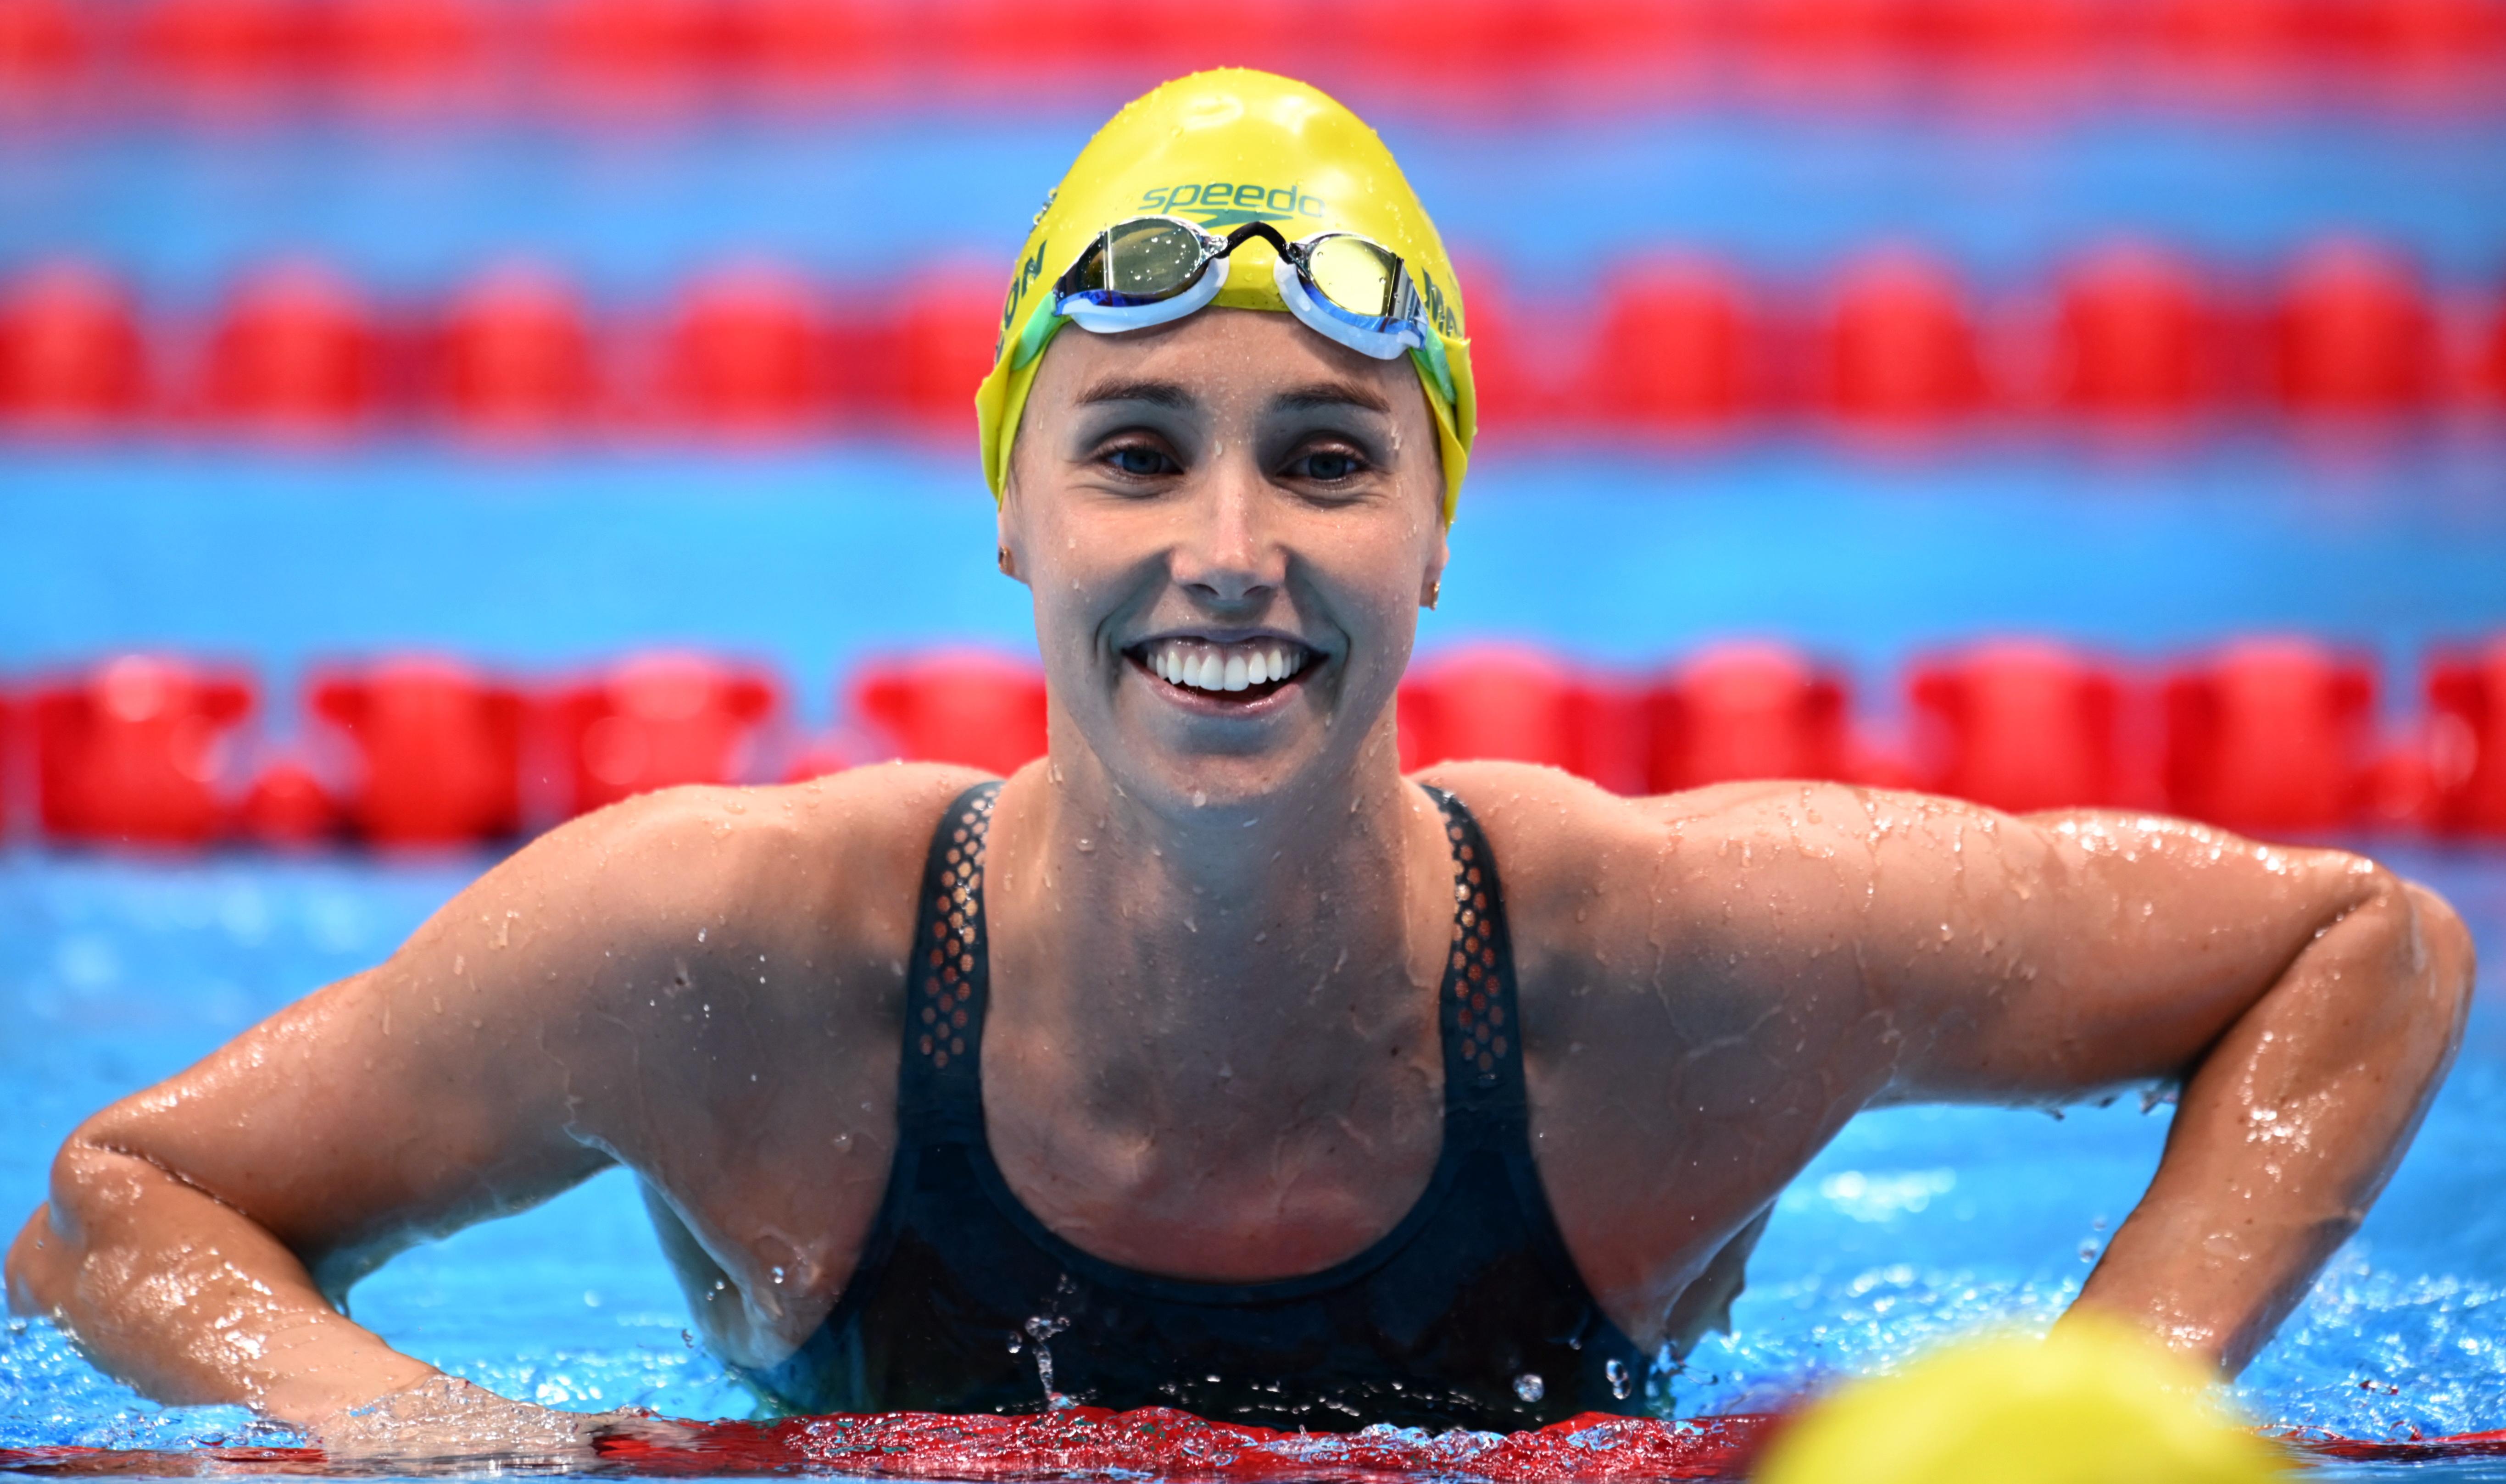 Tokyo 2020 Olympics - Swimming - Women's 50m Freestyle - Final - Tokyo Aquatics Centre - Tokyo, Japan - August 1, 2021. Emma McKeon of Australia reacts after race